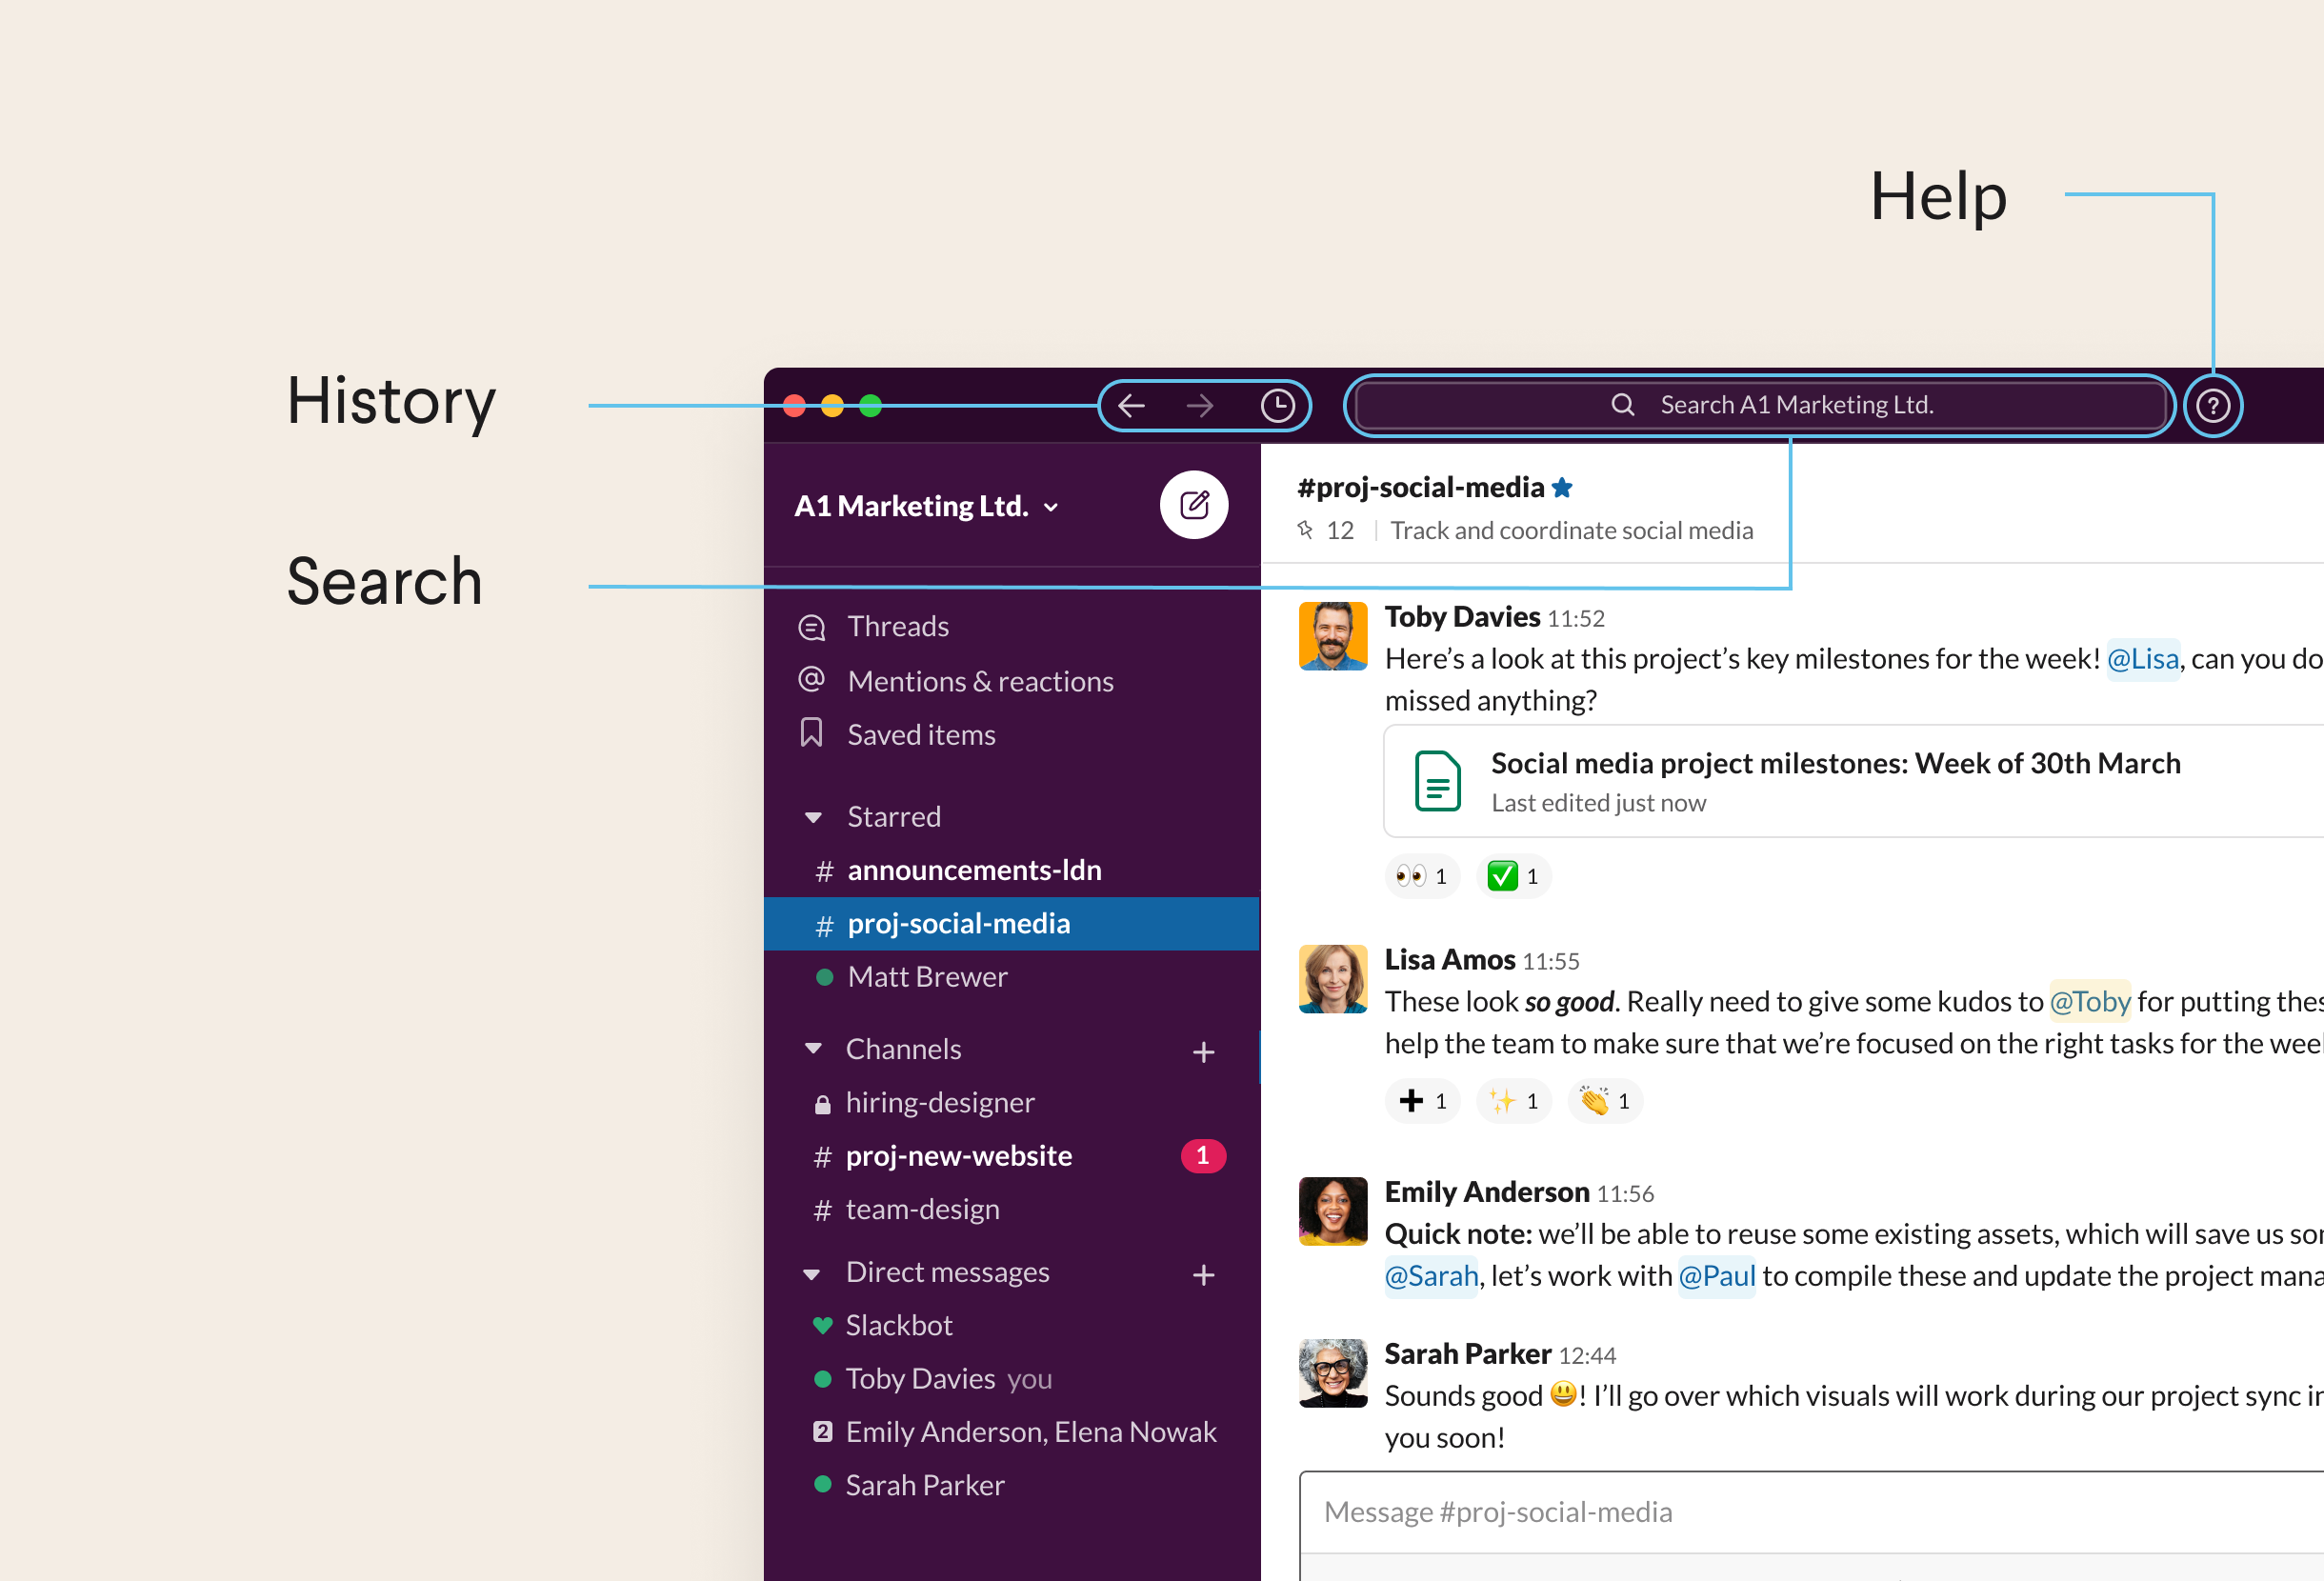 Top of Slack desktop app showing navigation icons and search bar